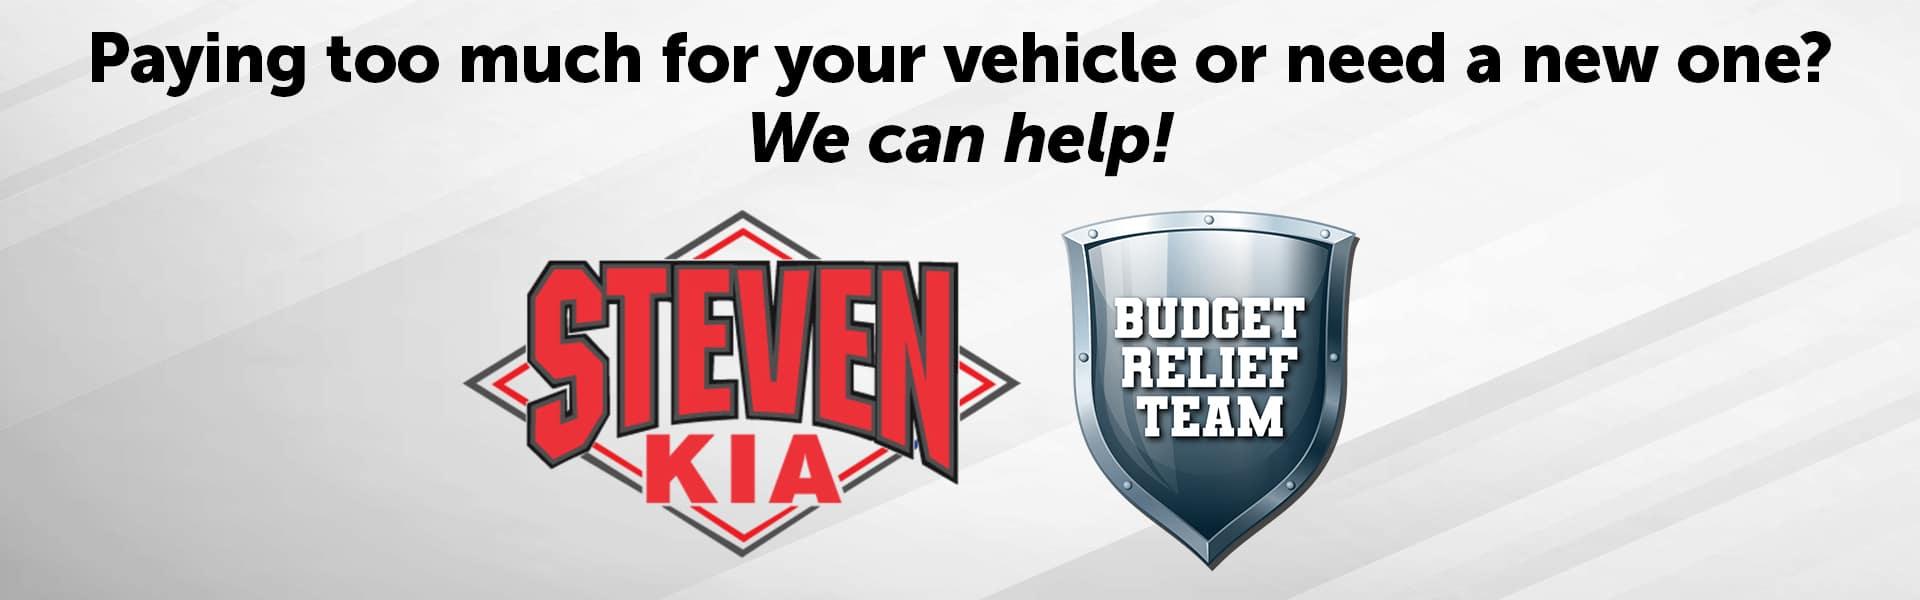 Steven KIA Budget Relief Team